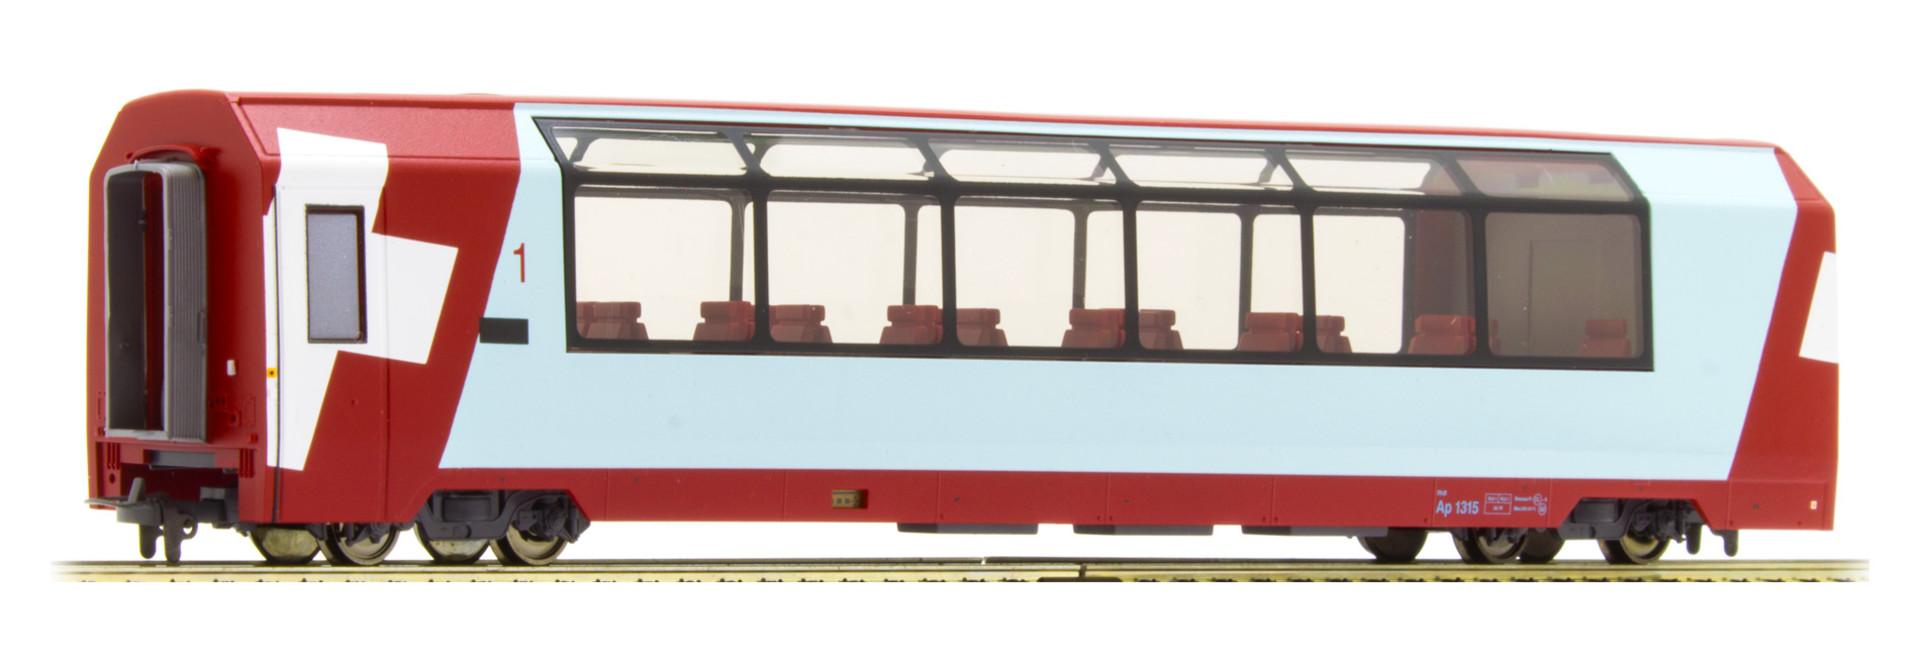 3289115 RhB Ap 1315 Panoramawagen GEX